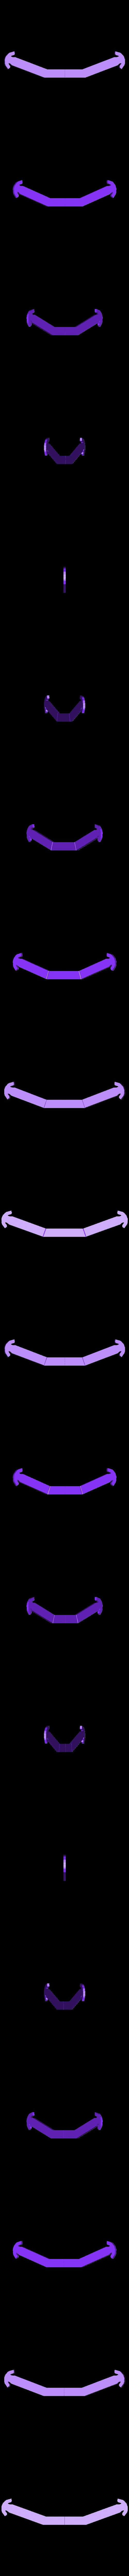 CCR10_correa mascarilla v5.stl Download free OBJ file one-size-fits-all mask attachment • 3D printable design, eduardojcch